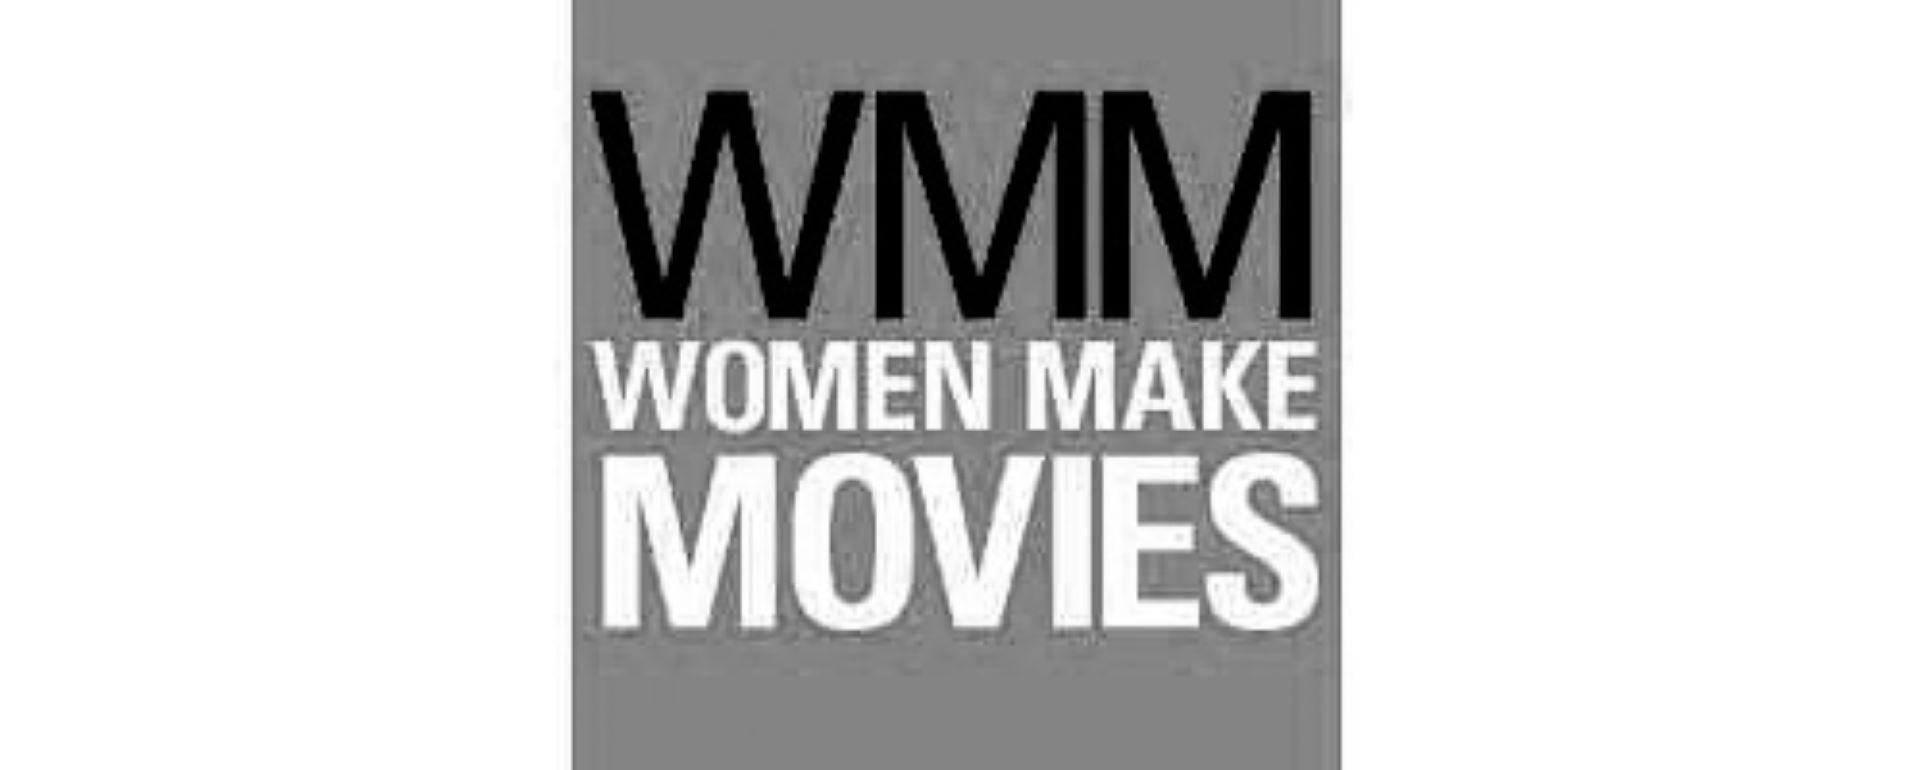 WOMAN MAKE MOVIES